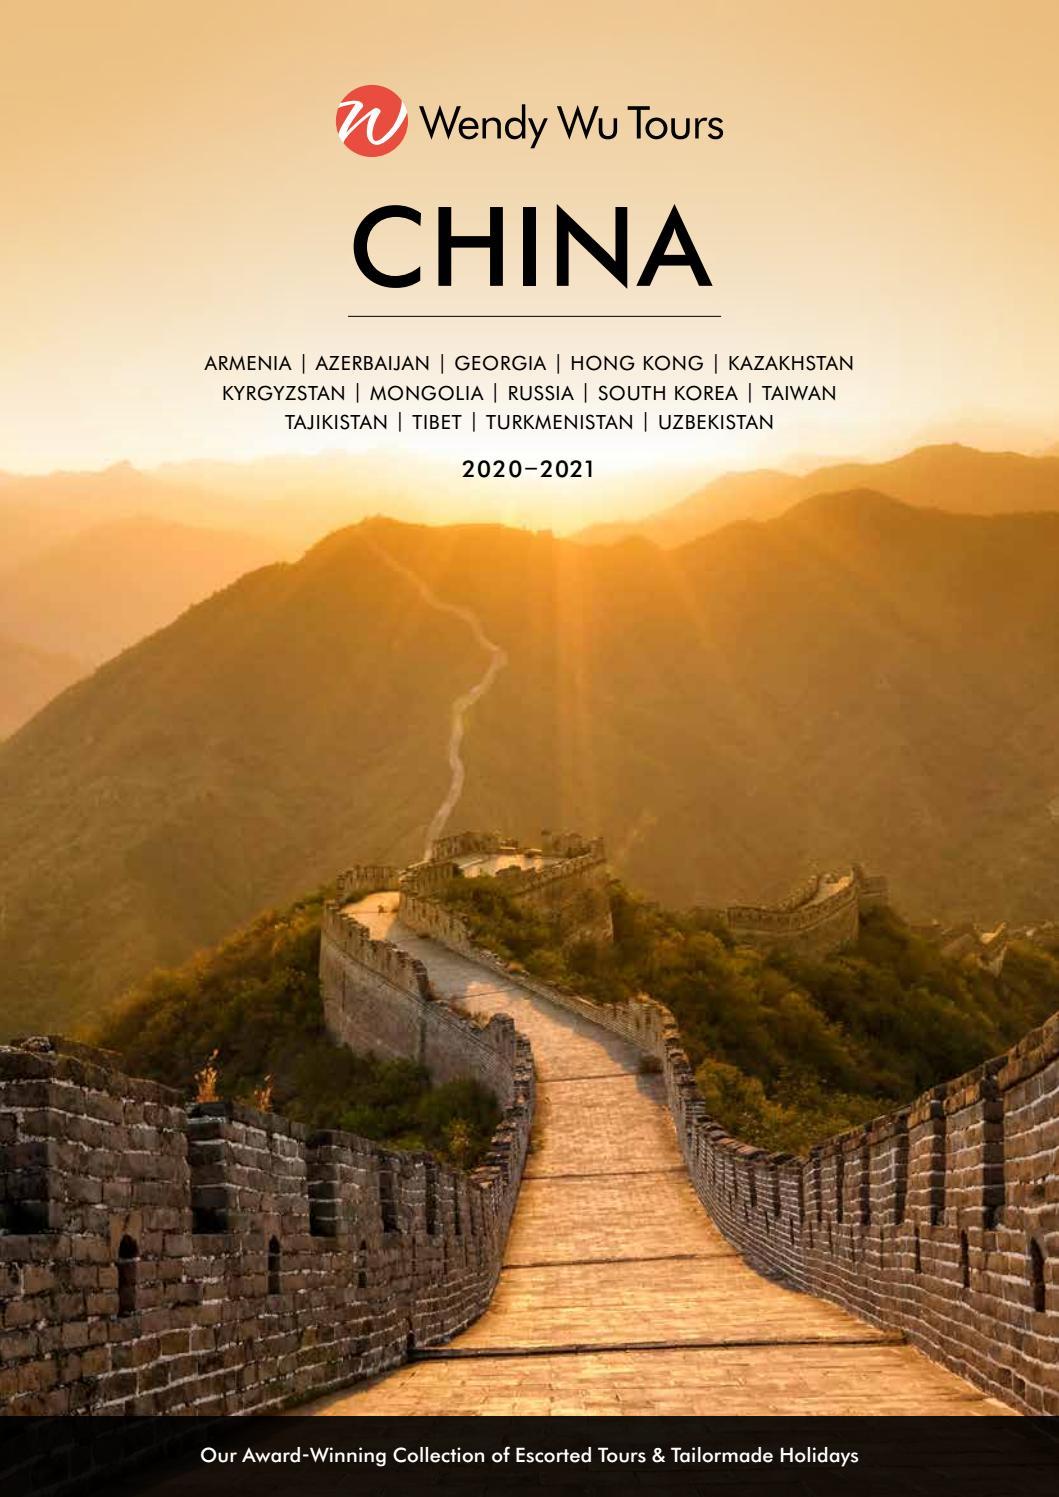 China Brochure 2020 2021 Uk By Wendy Wu Tours Issuu